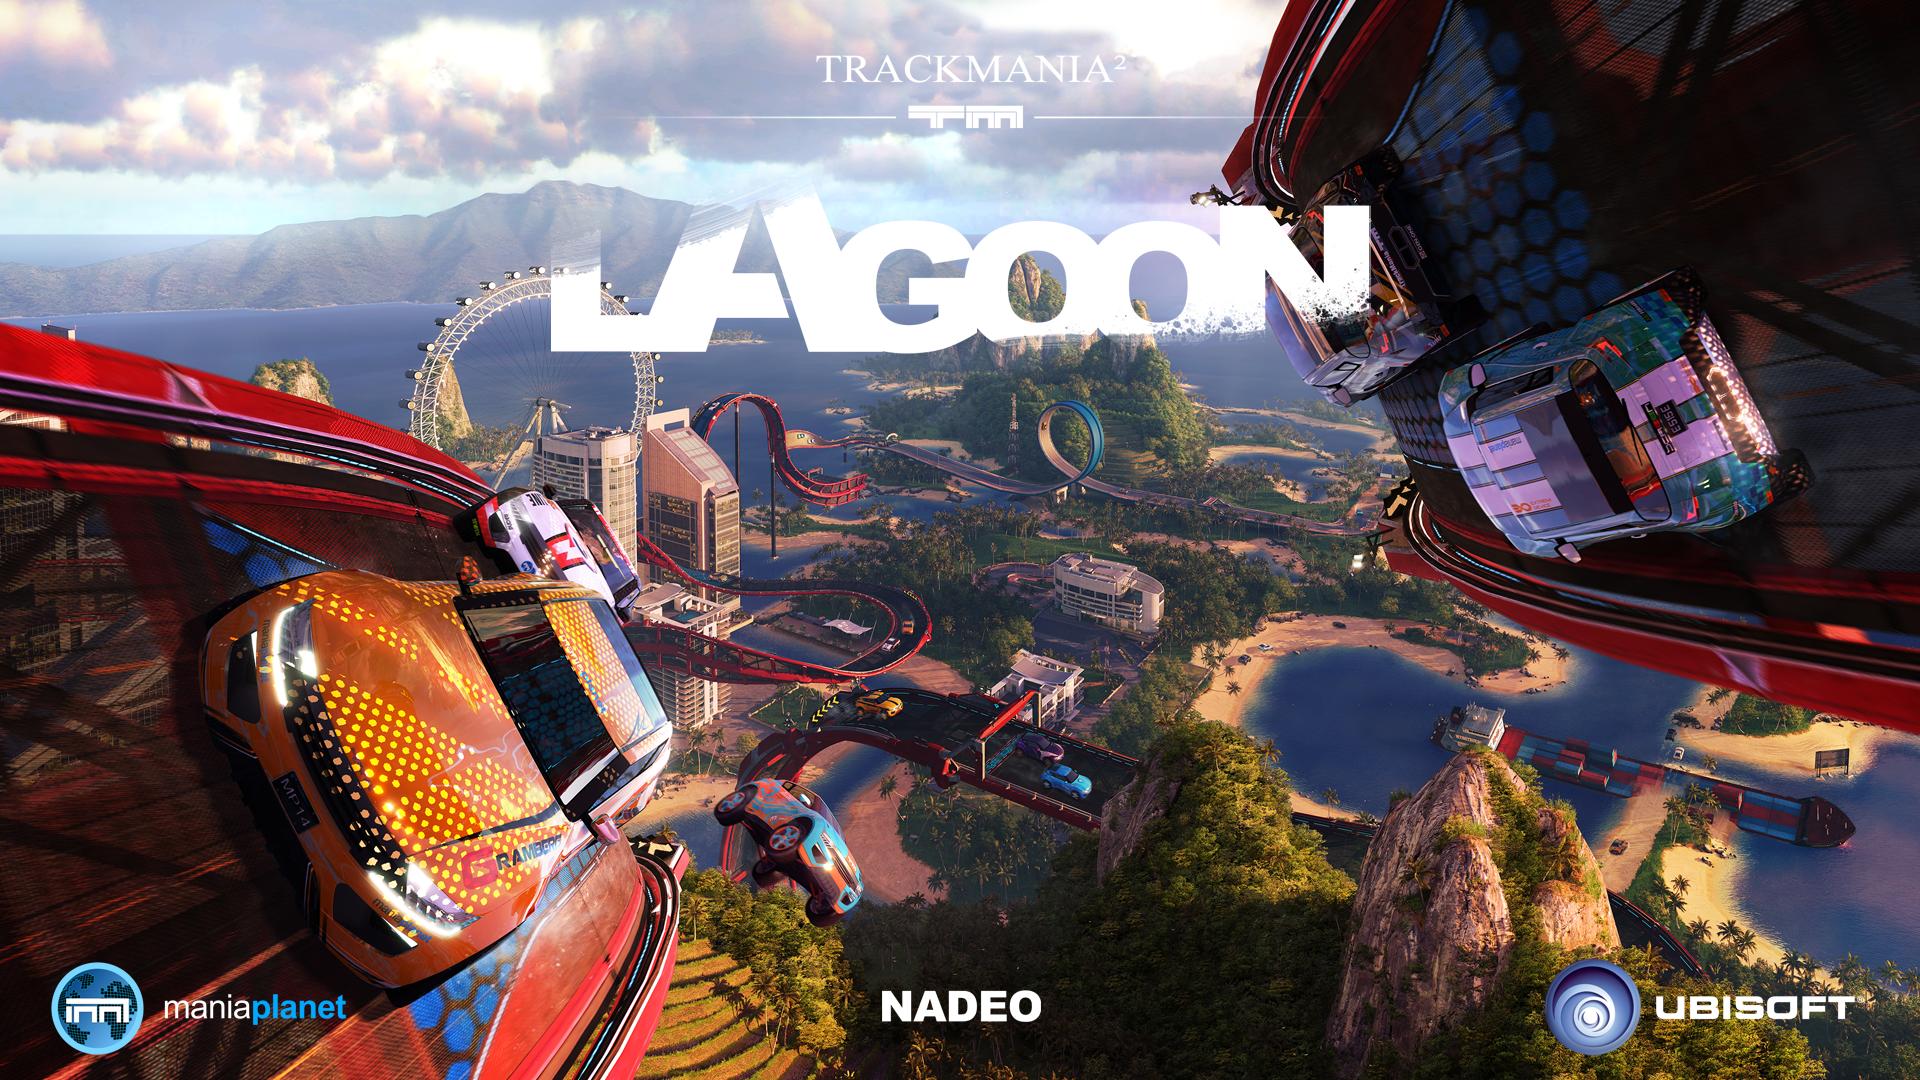 Trackmania2 Lagoon